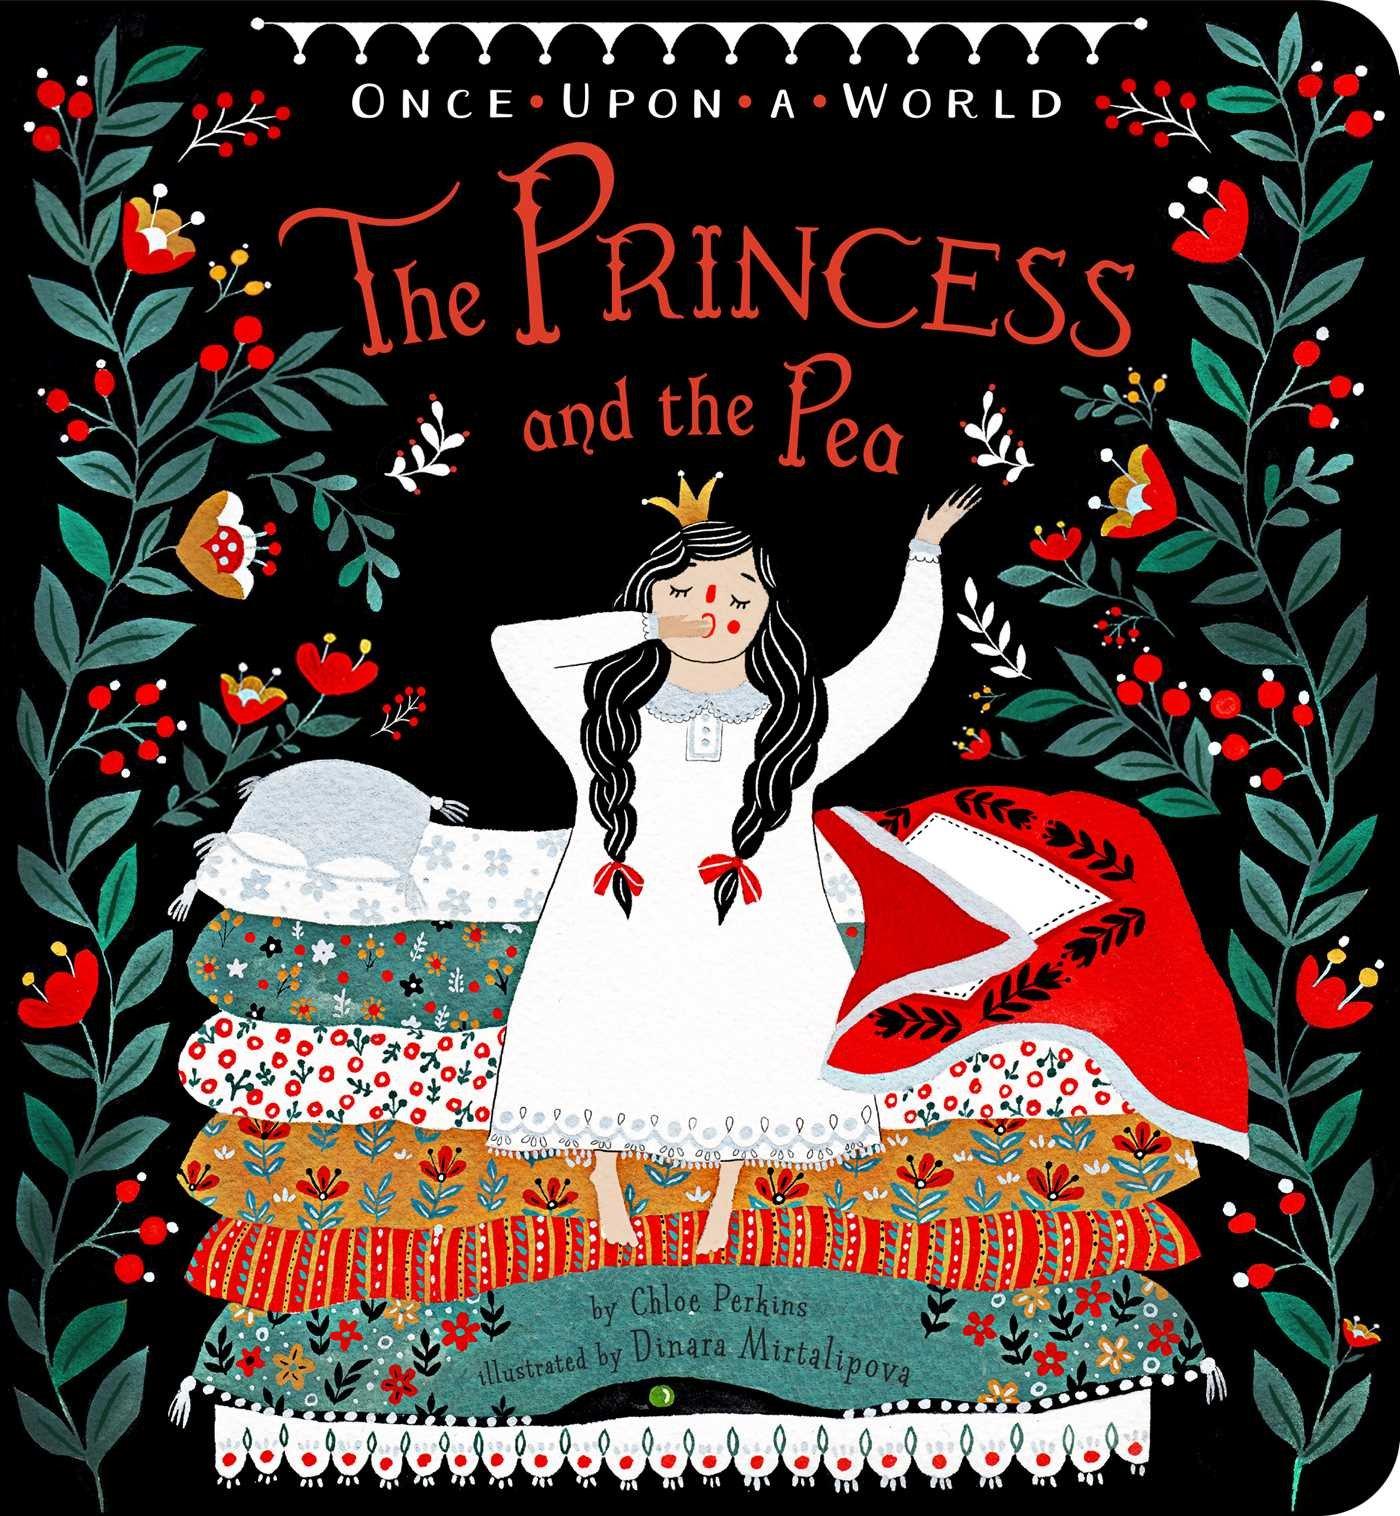 SOI Original Art Show 2017 - ARTIST: Dinara MirtalipovaTITLE: The Princess and the PeaCLIENT: Simon & Schuster